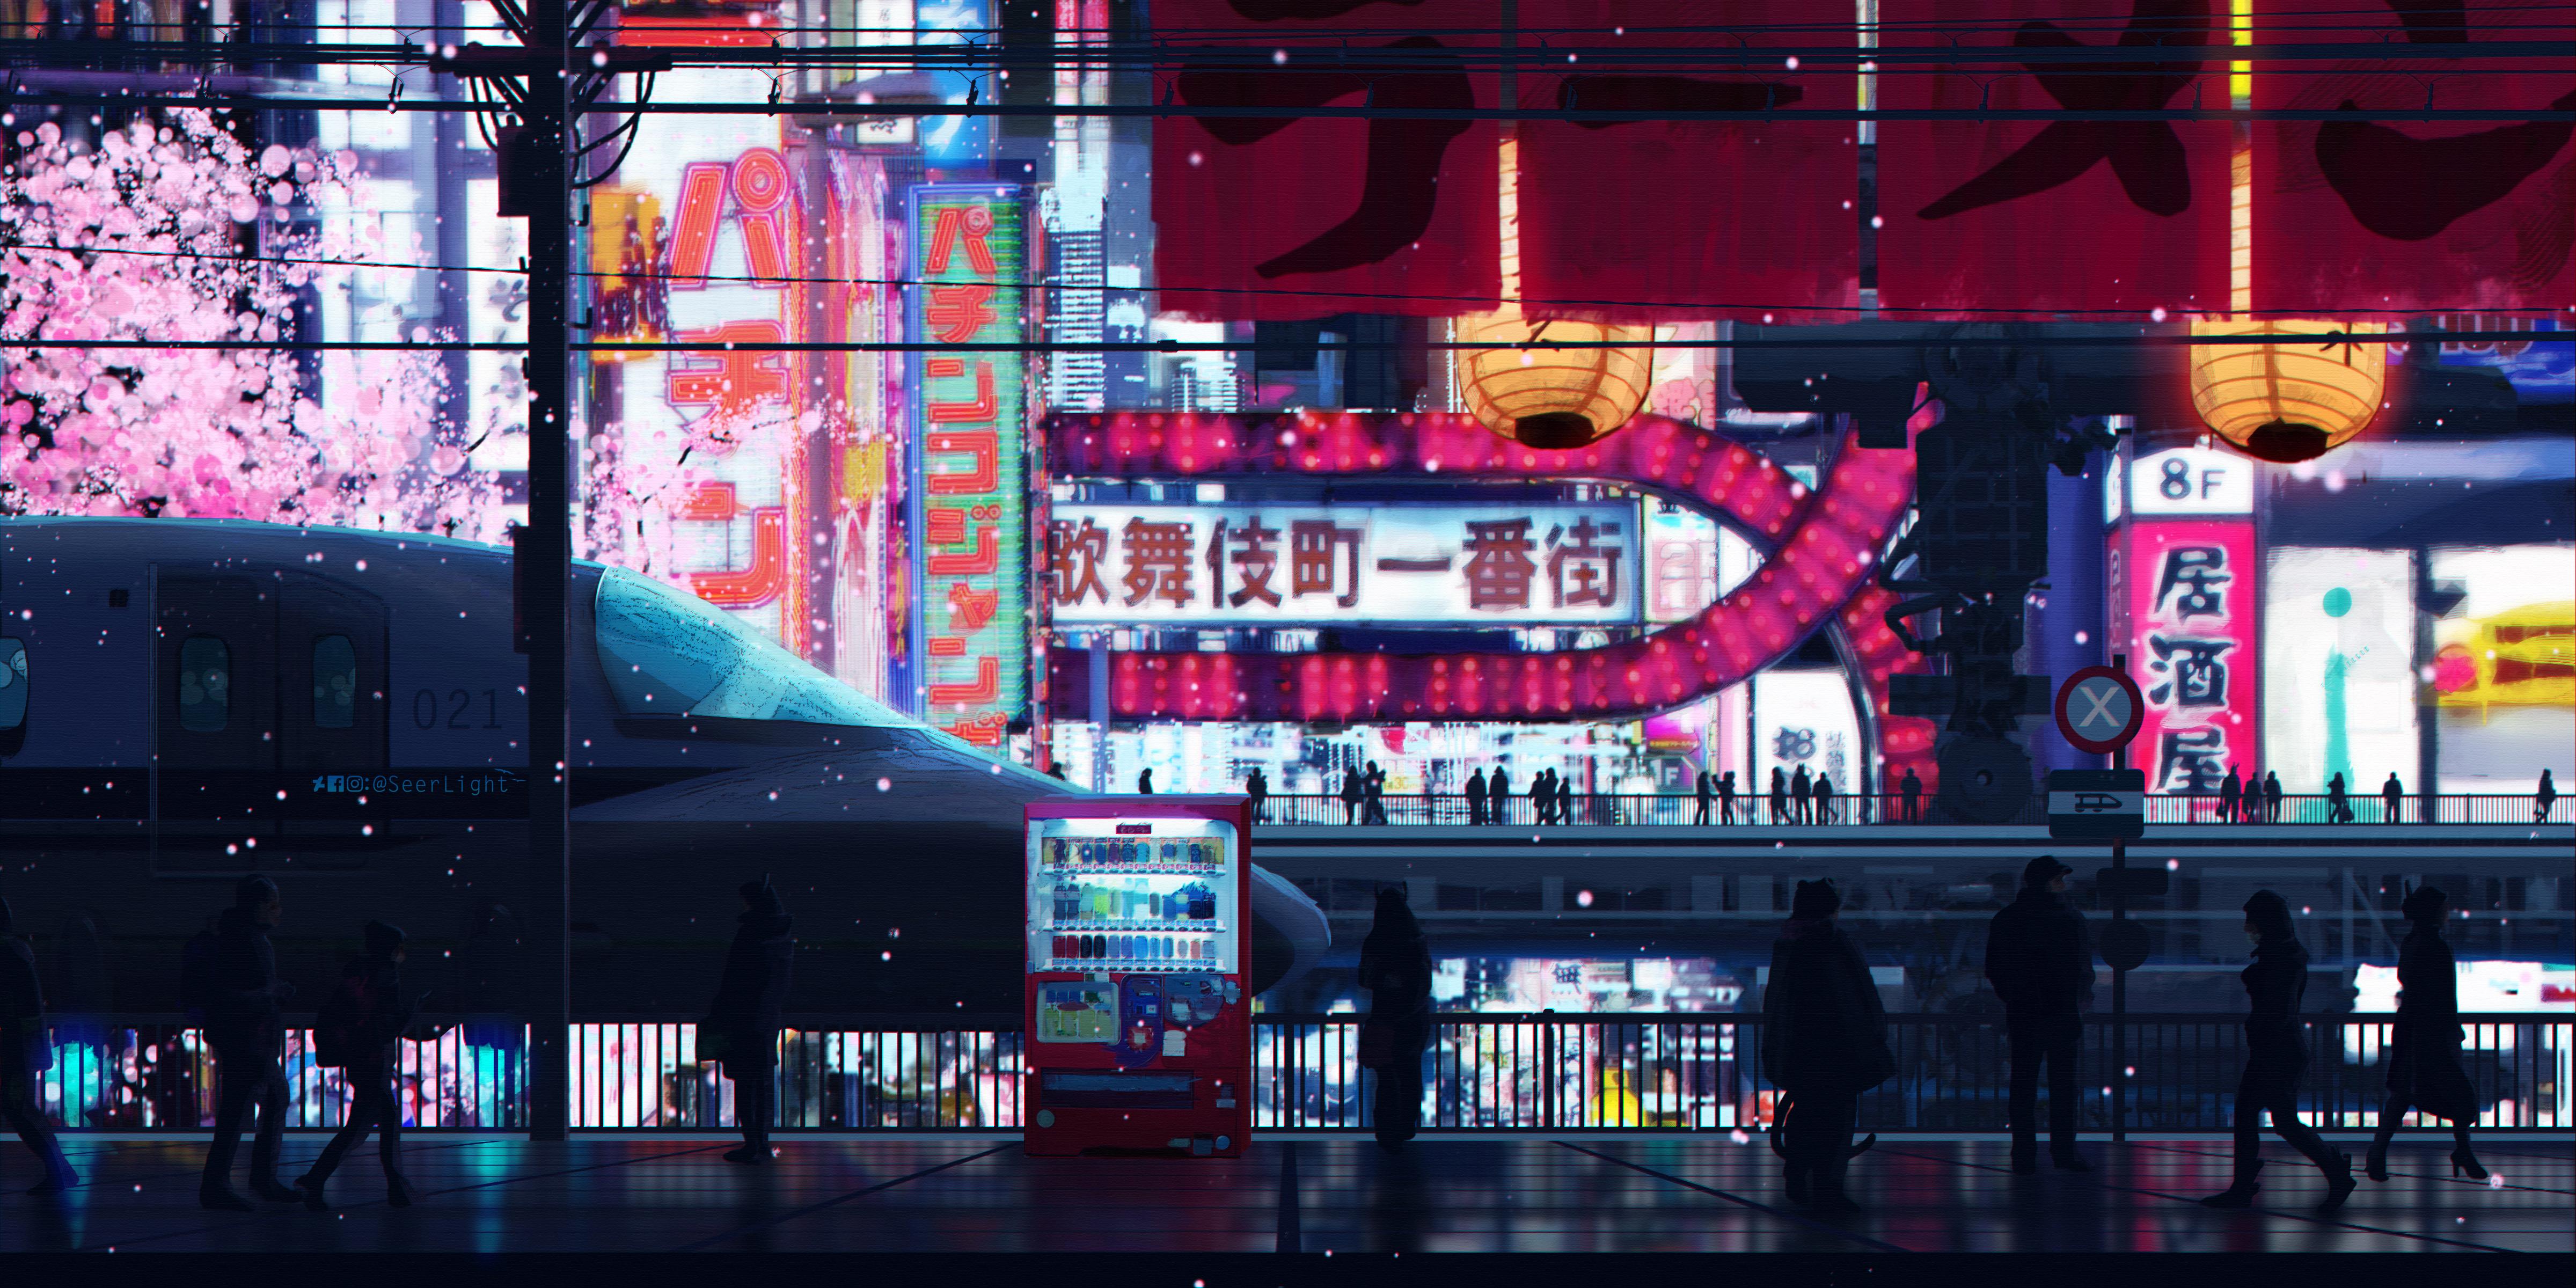 General 4800x2400 digital art artwork Japan city street cityscape vending machine cyberpunk Tokyo train